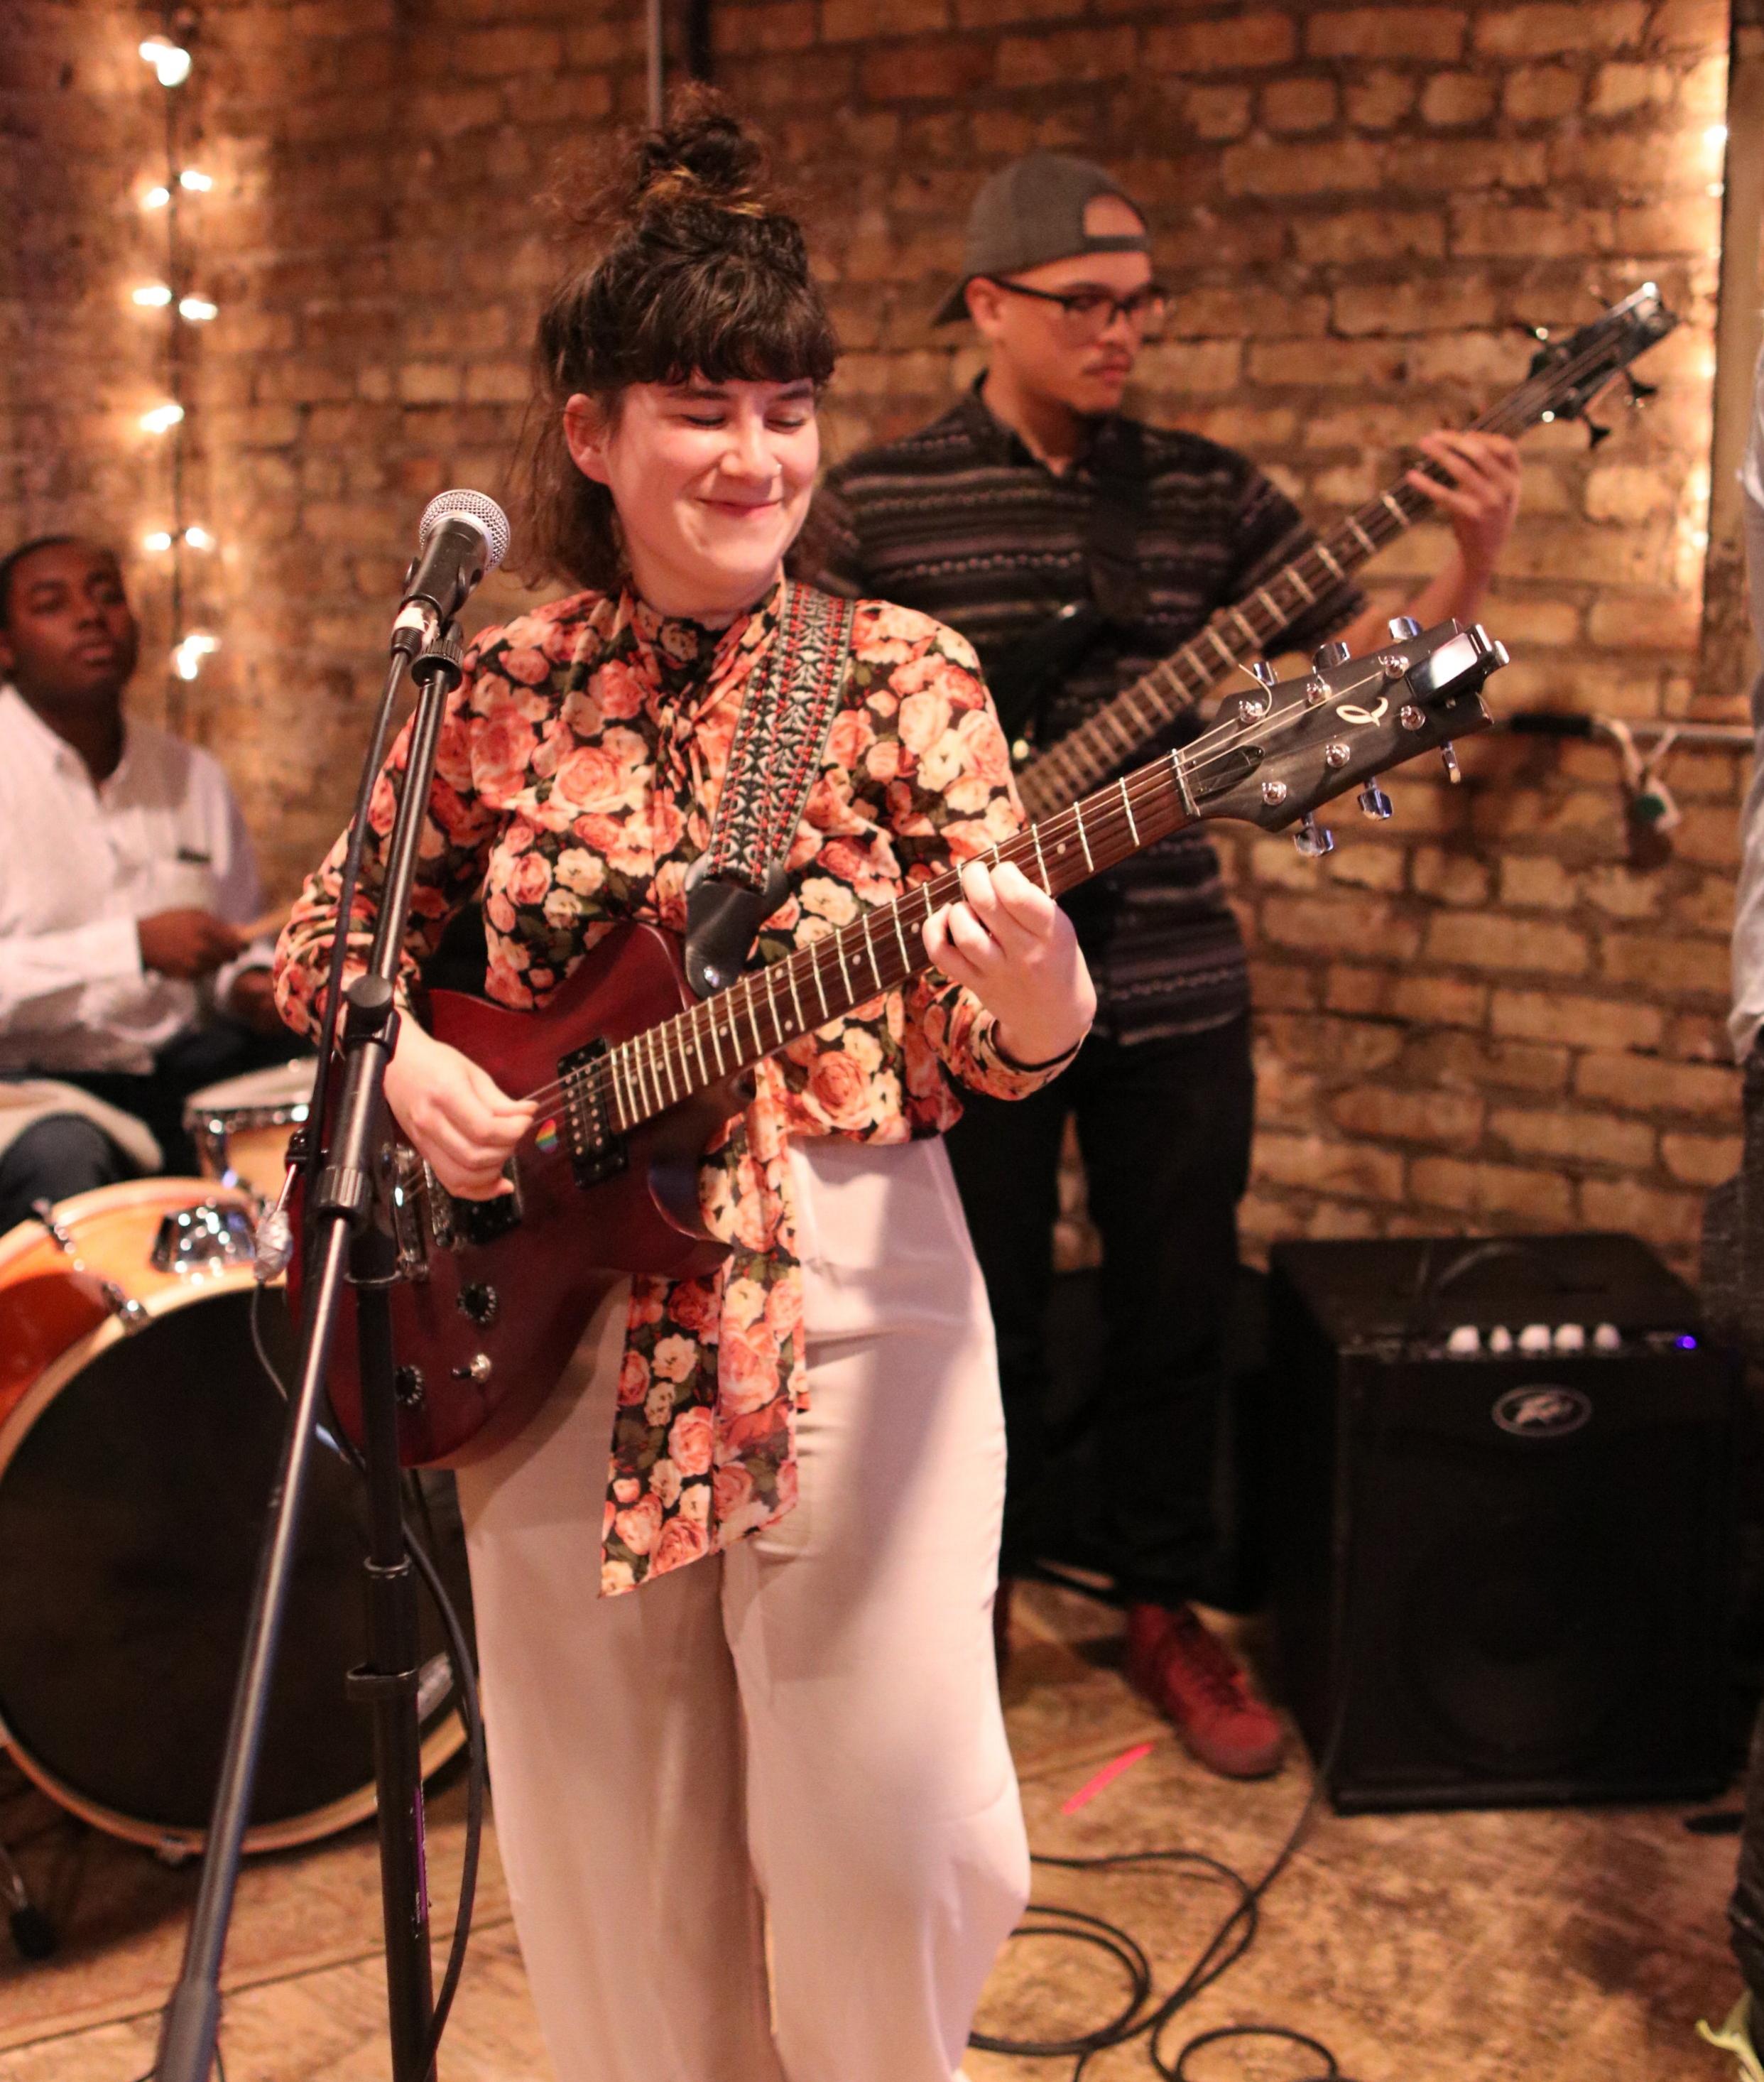 Jordanna performing at the Shredded One Year Celebration. Photo courtesy of Wendy Davis